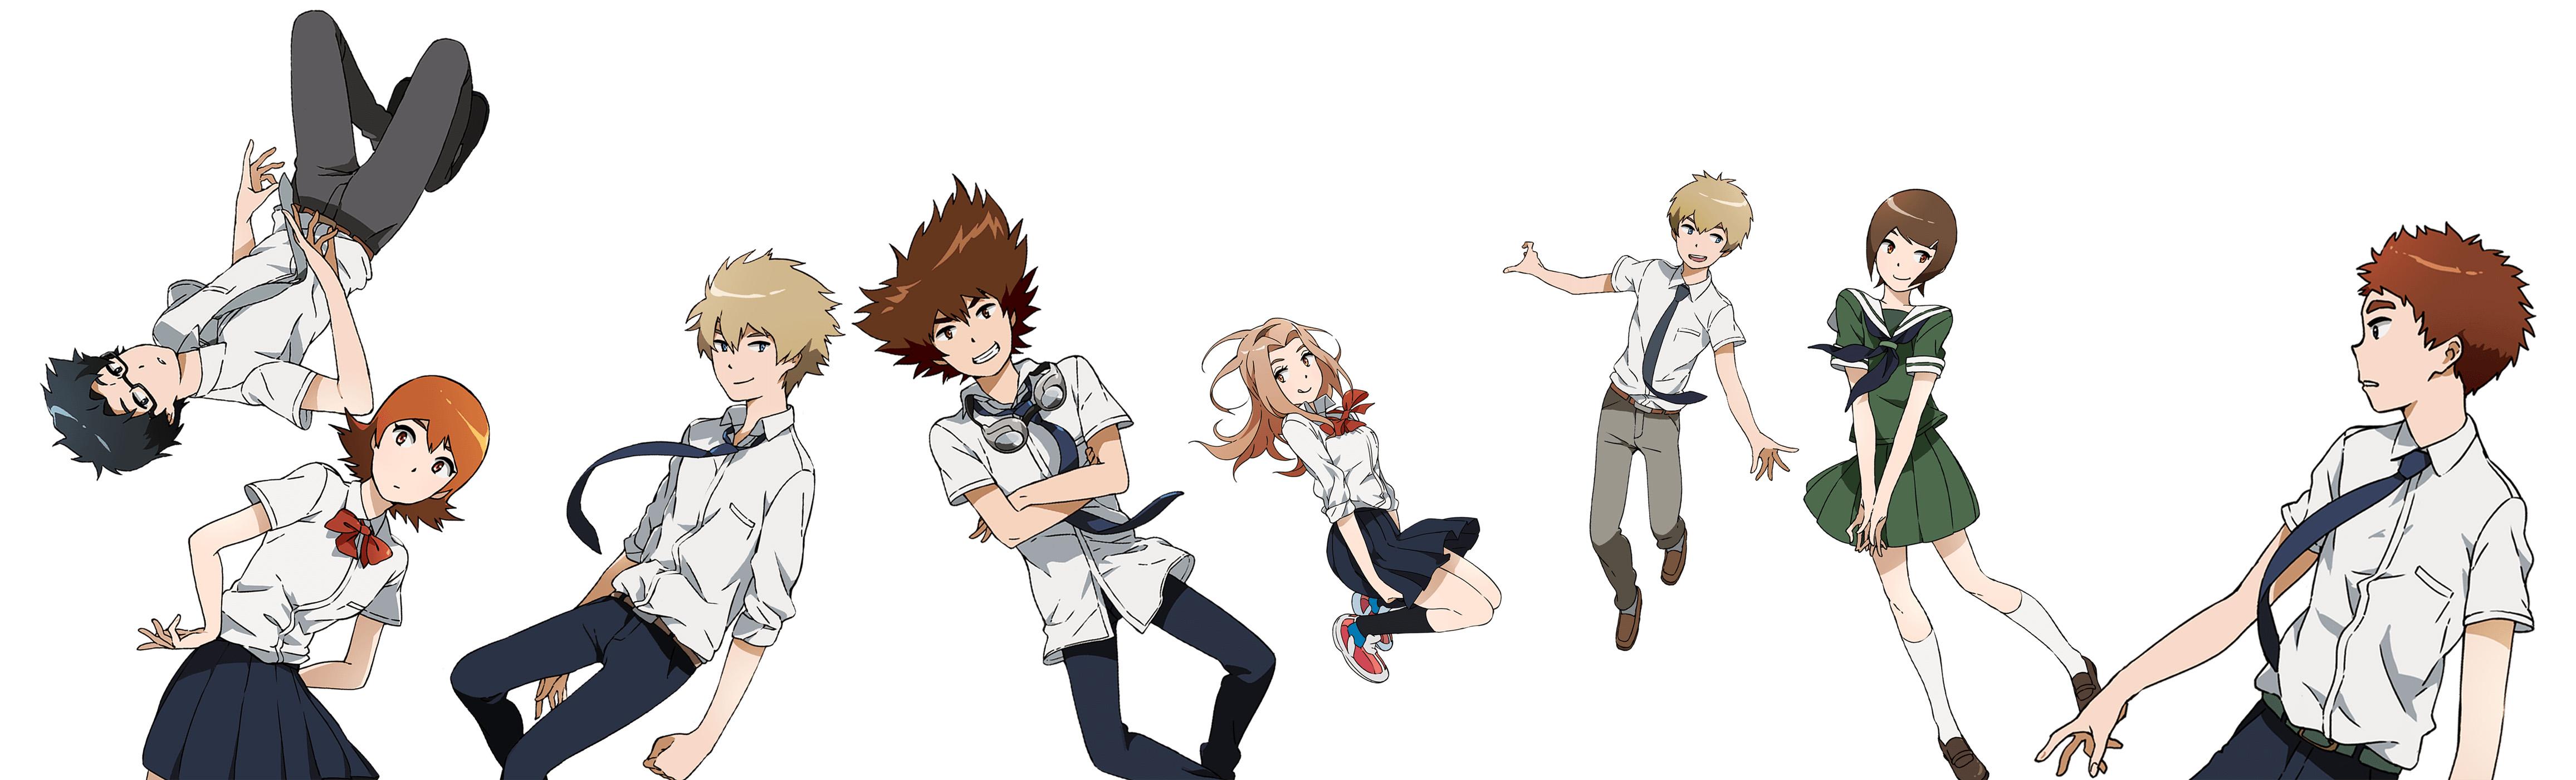 New Digimon Adventure Tri Character Design Visuals 1